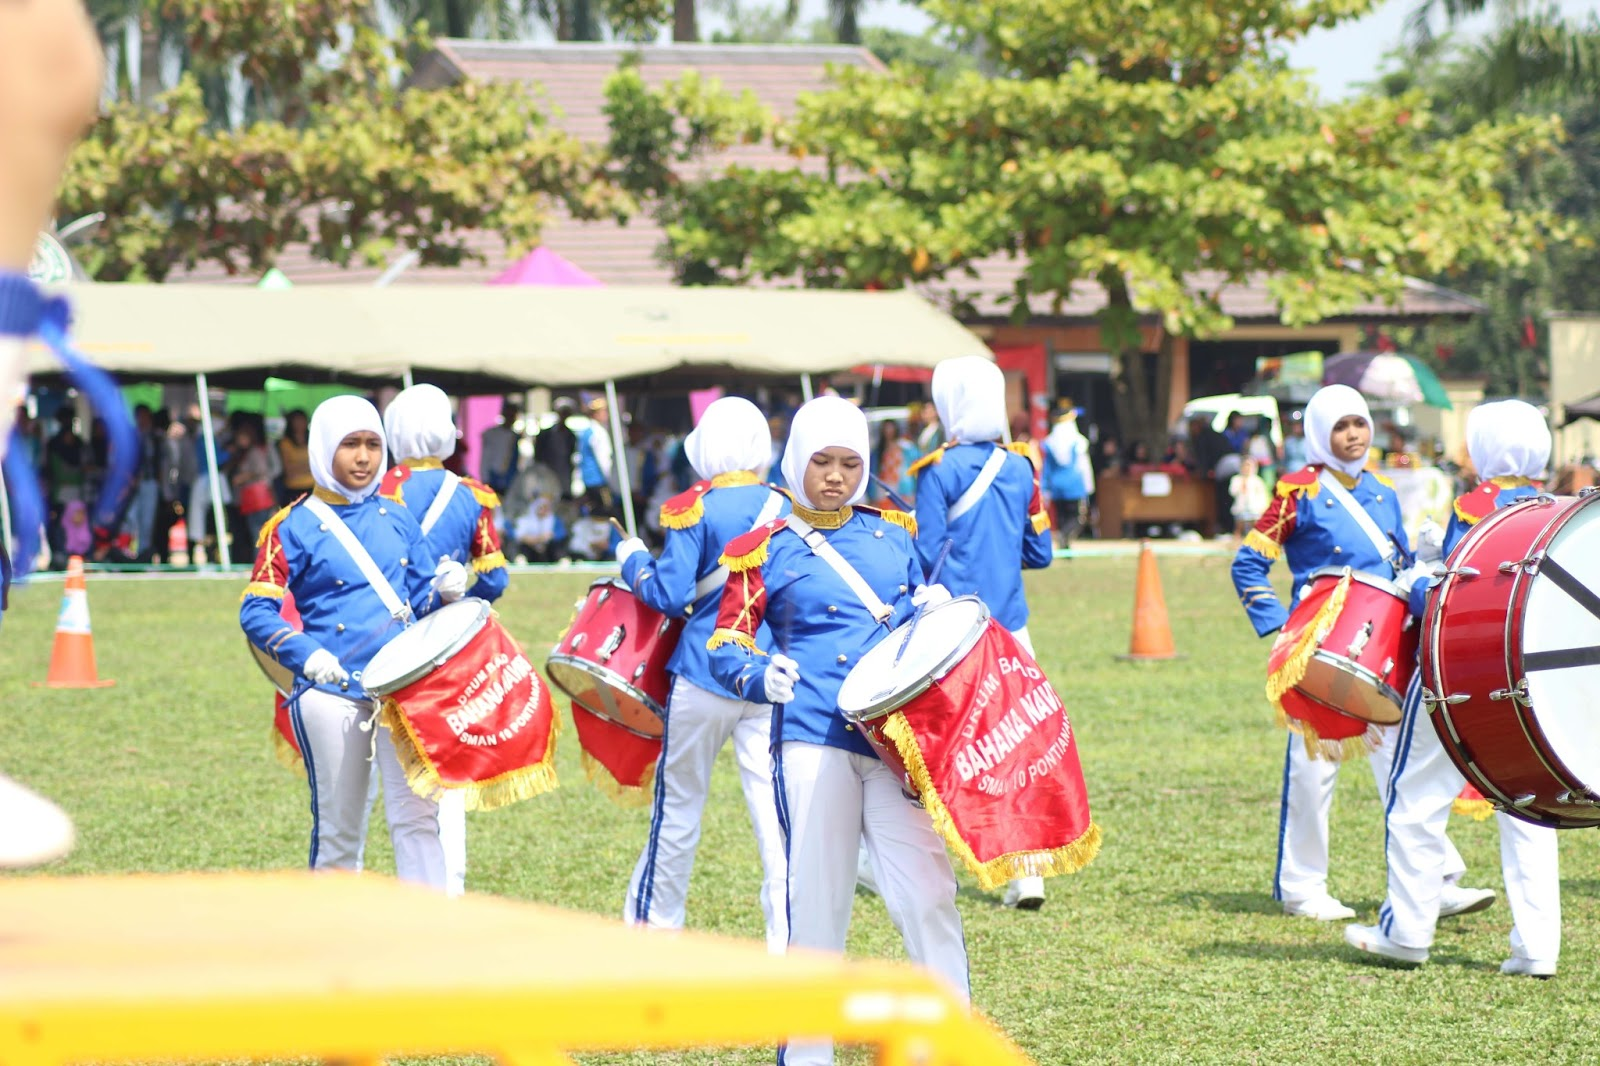 Bahana Naviri Drum Band Sman 10 Pontianak Part 9 Polda Nilai Education Ii